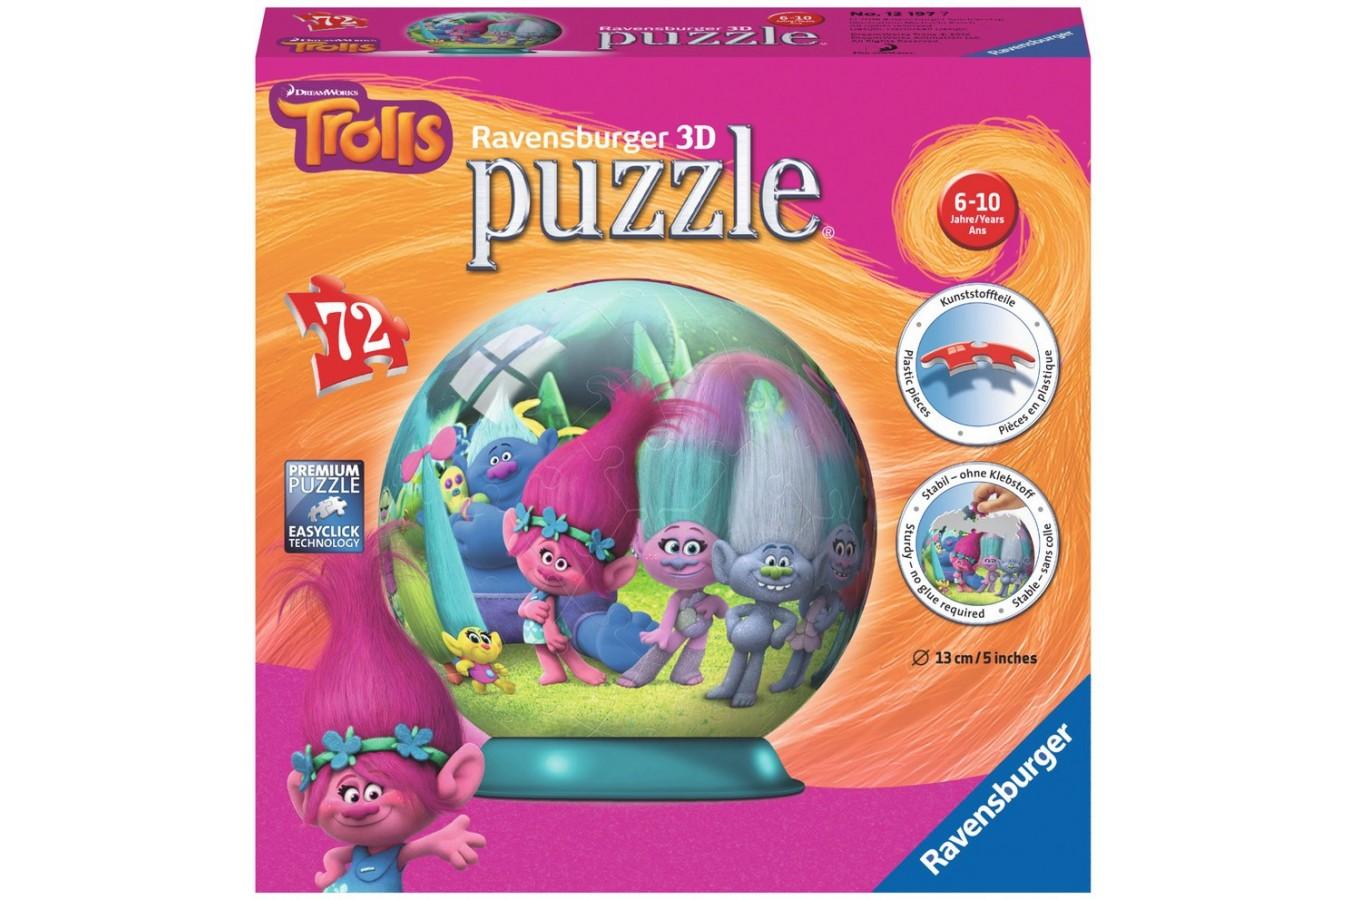 Puzzle glob Ravensburger - Trolls, 72 piese (12197)